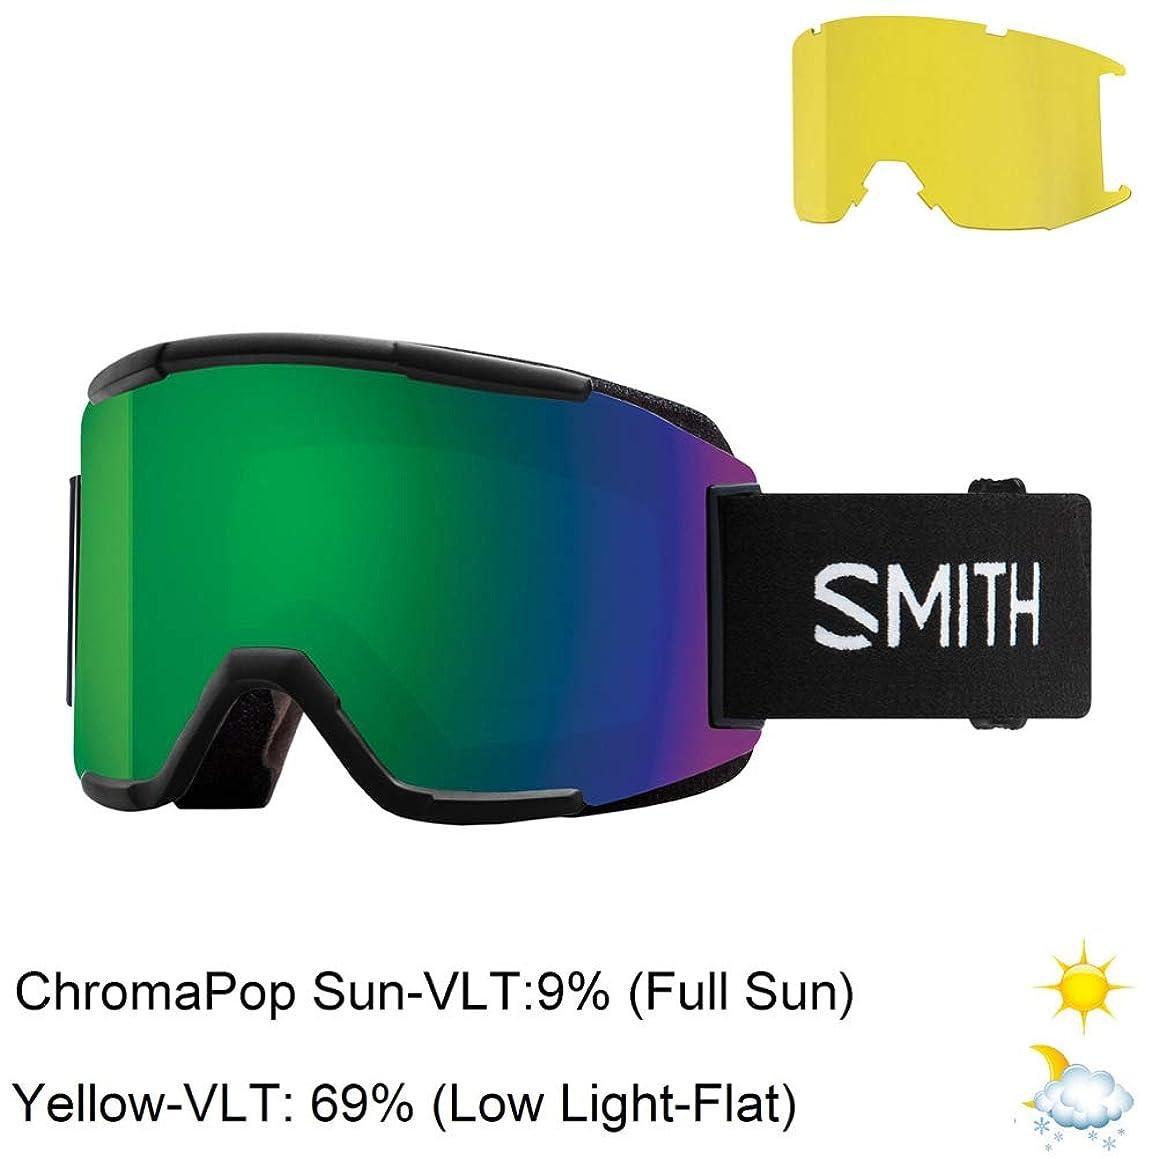 Smith Optics Squad Adult Snow Goggles - Black/Chromapop Sun Green Mirror/One Size